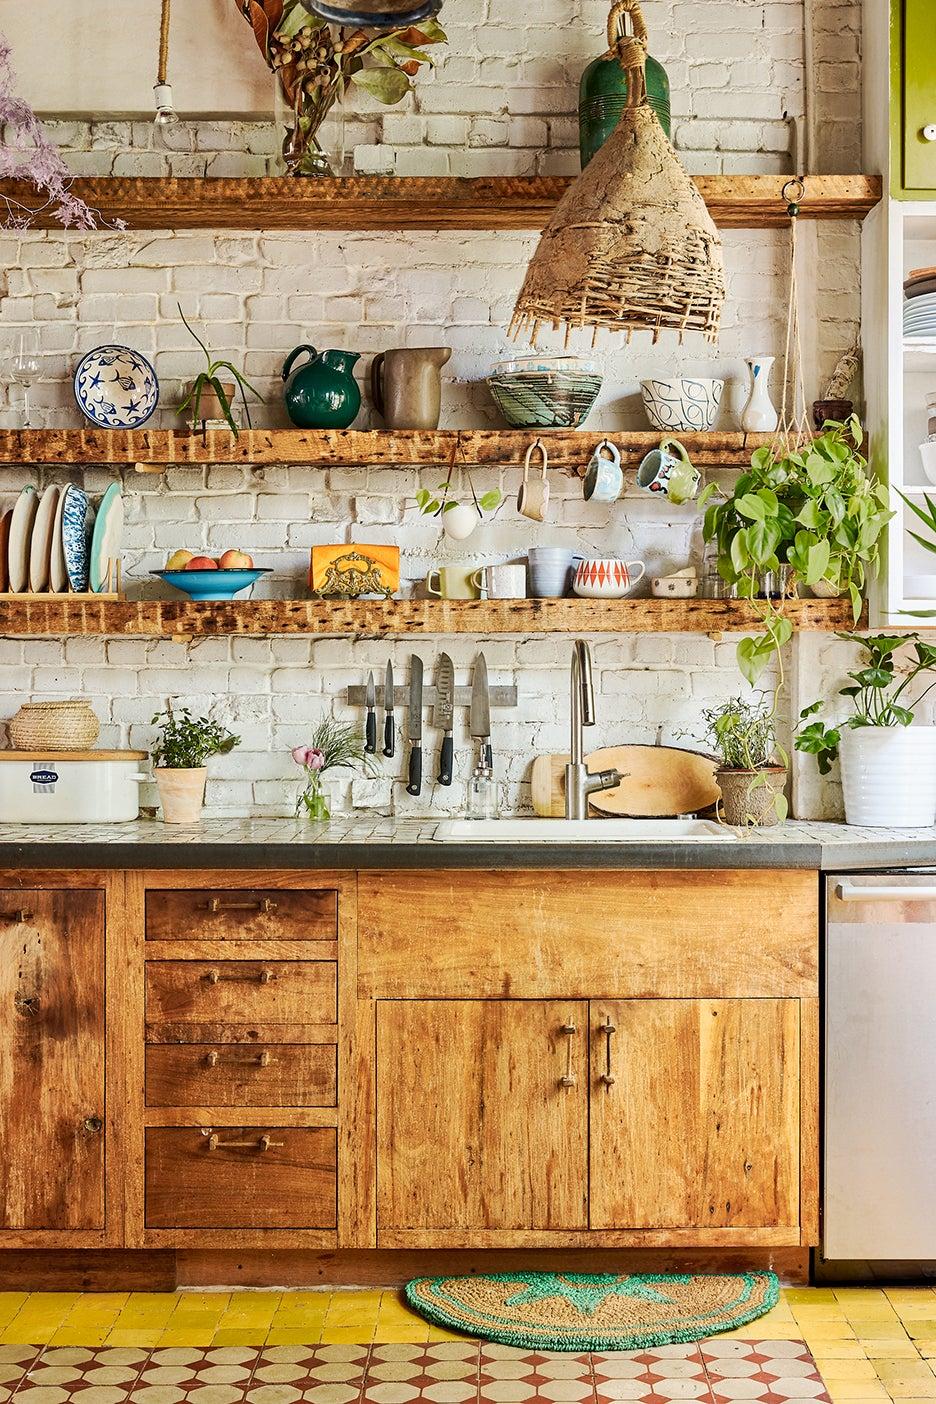 pretty kitchen and counter